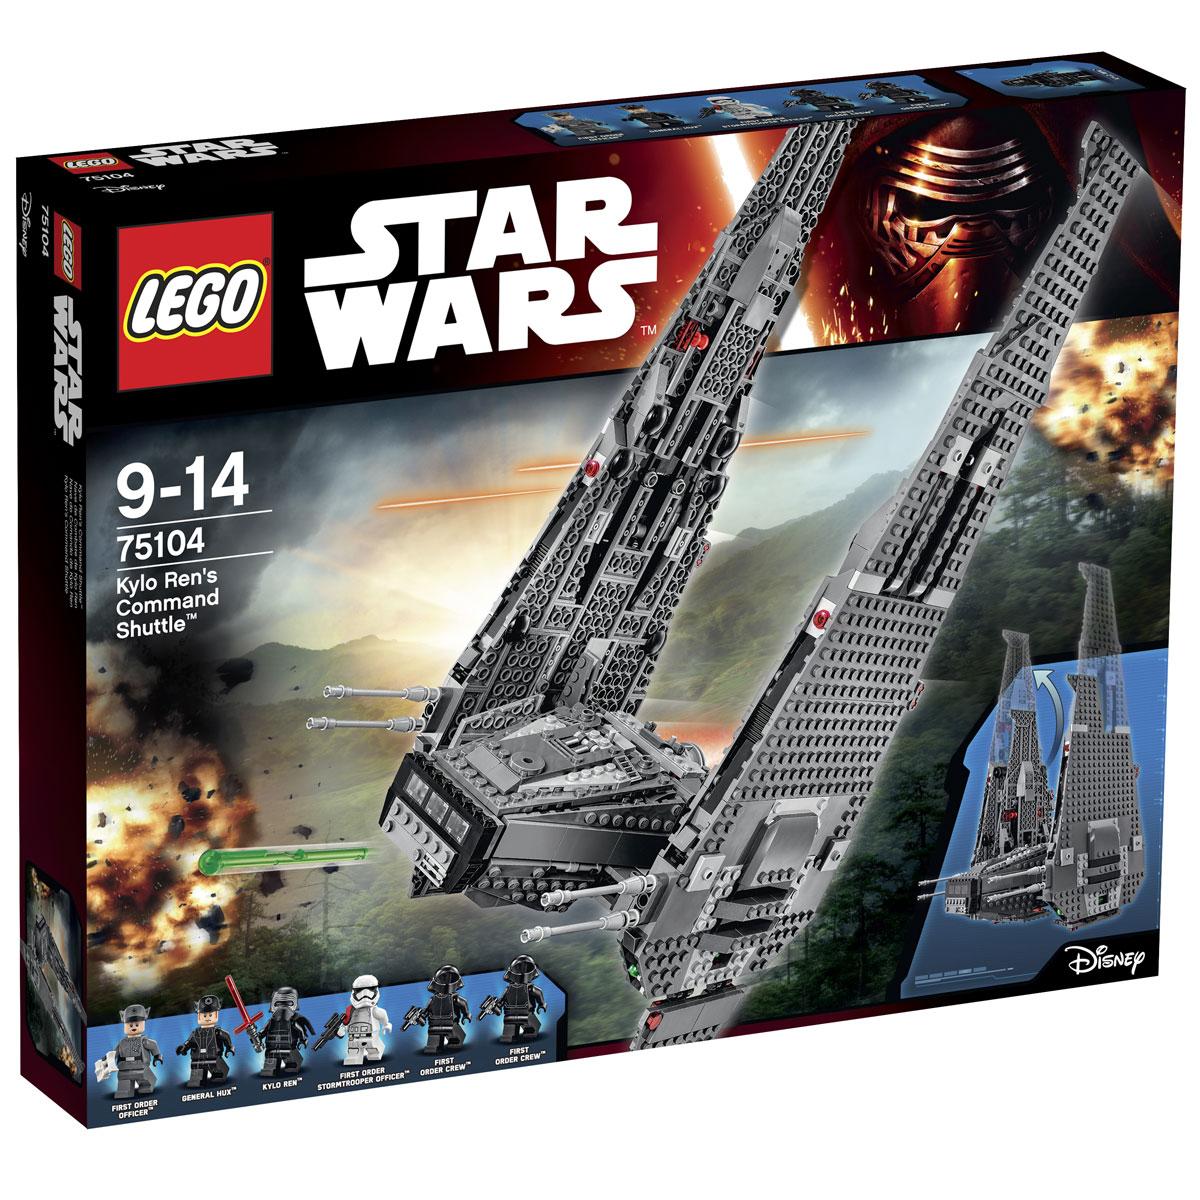 LEGO Star Wars Конструктор Командный шаттл Кайло Рена 75104 lego 75104 командный шаттл кайло рена